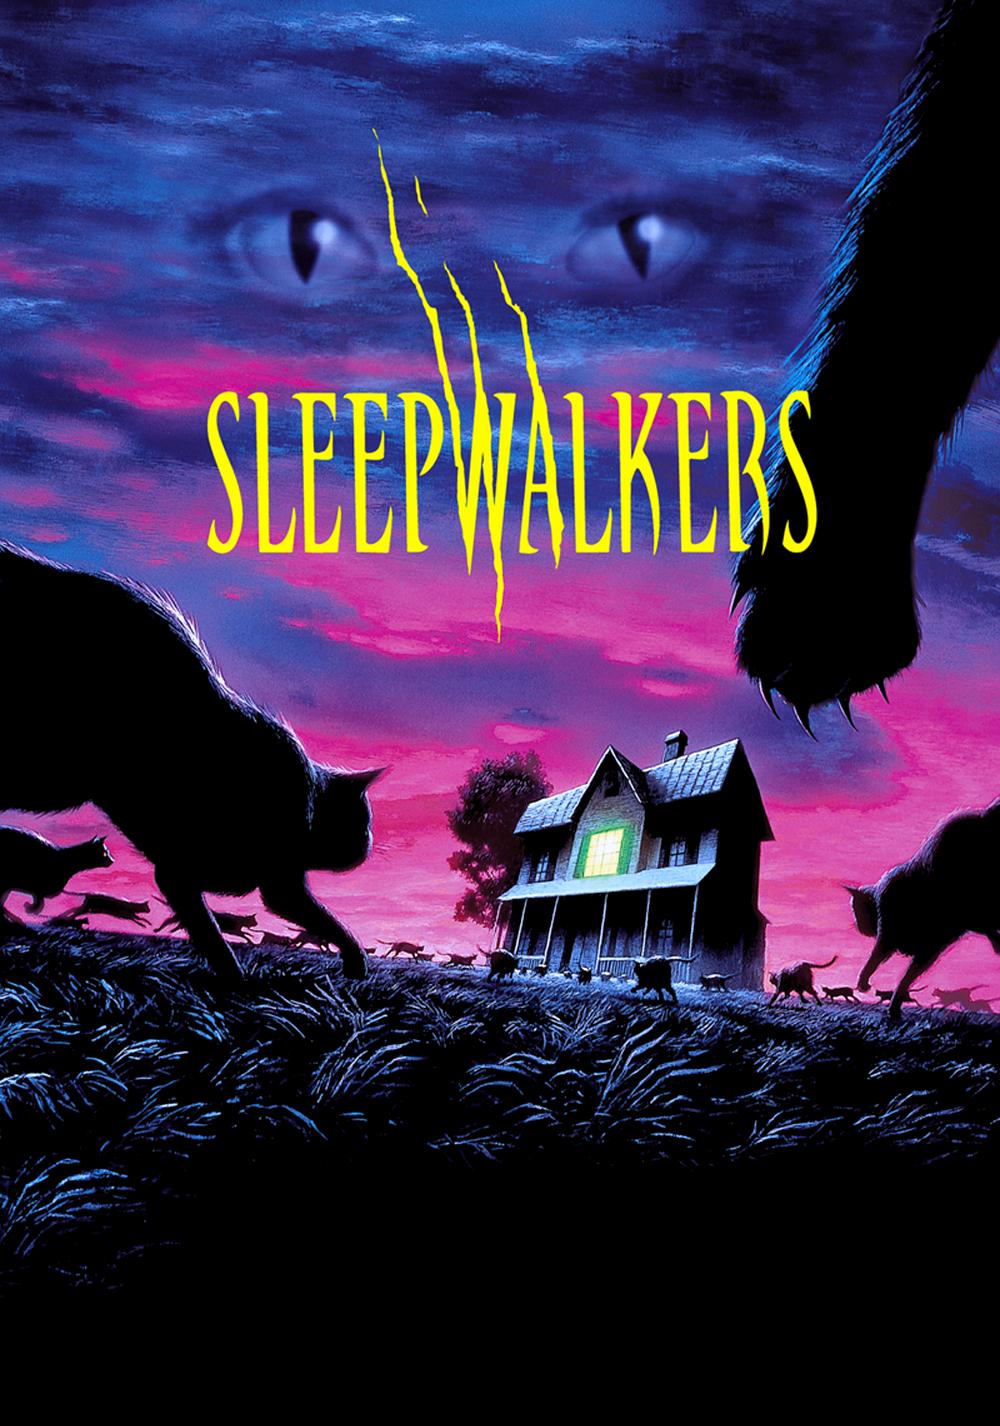 sleepwalkers-56a0986dd054d.jpg